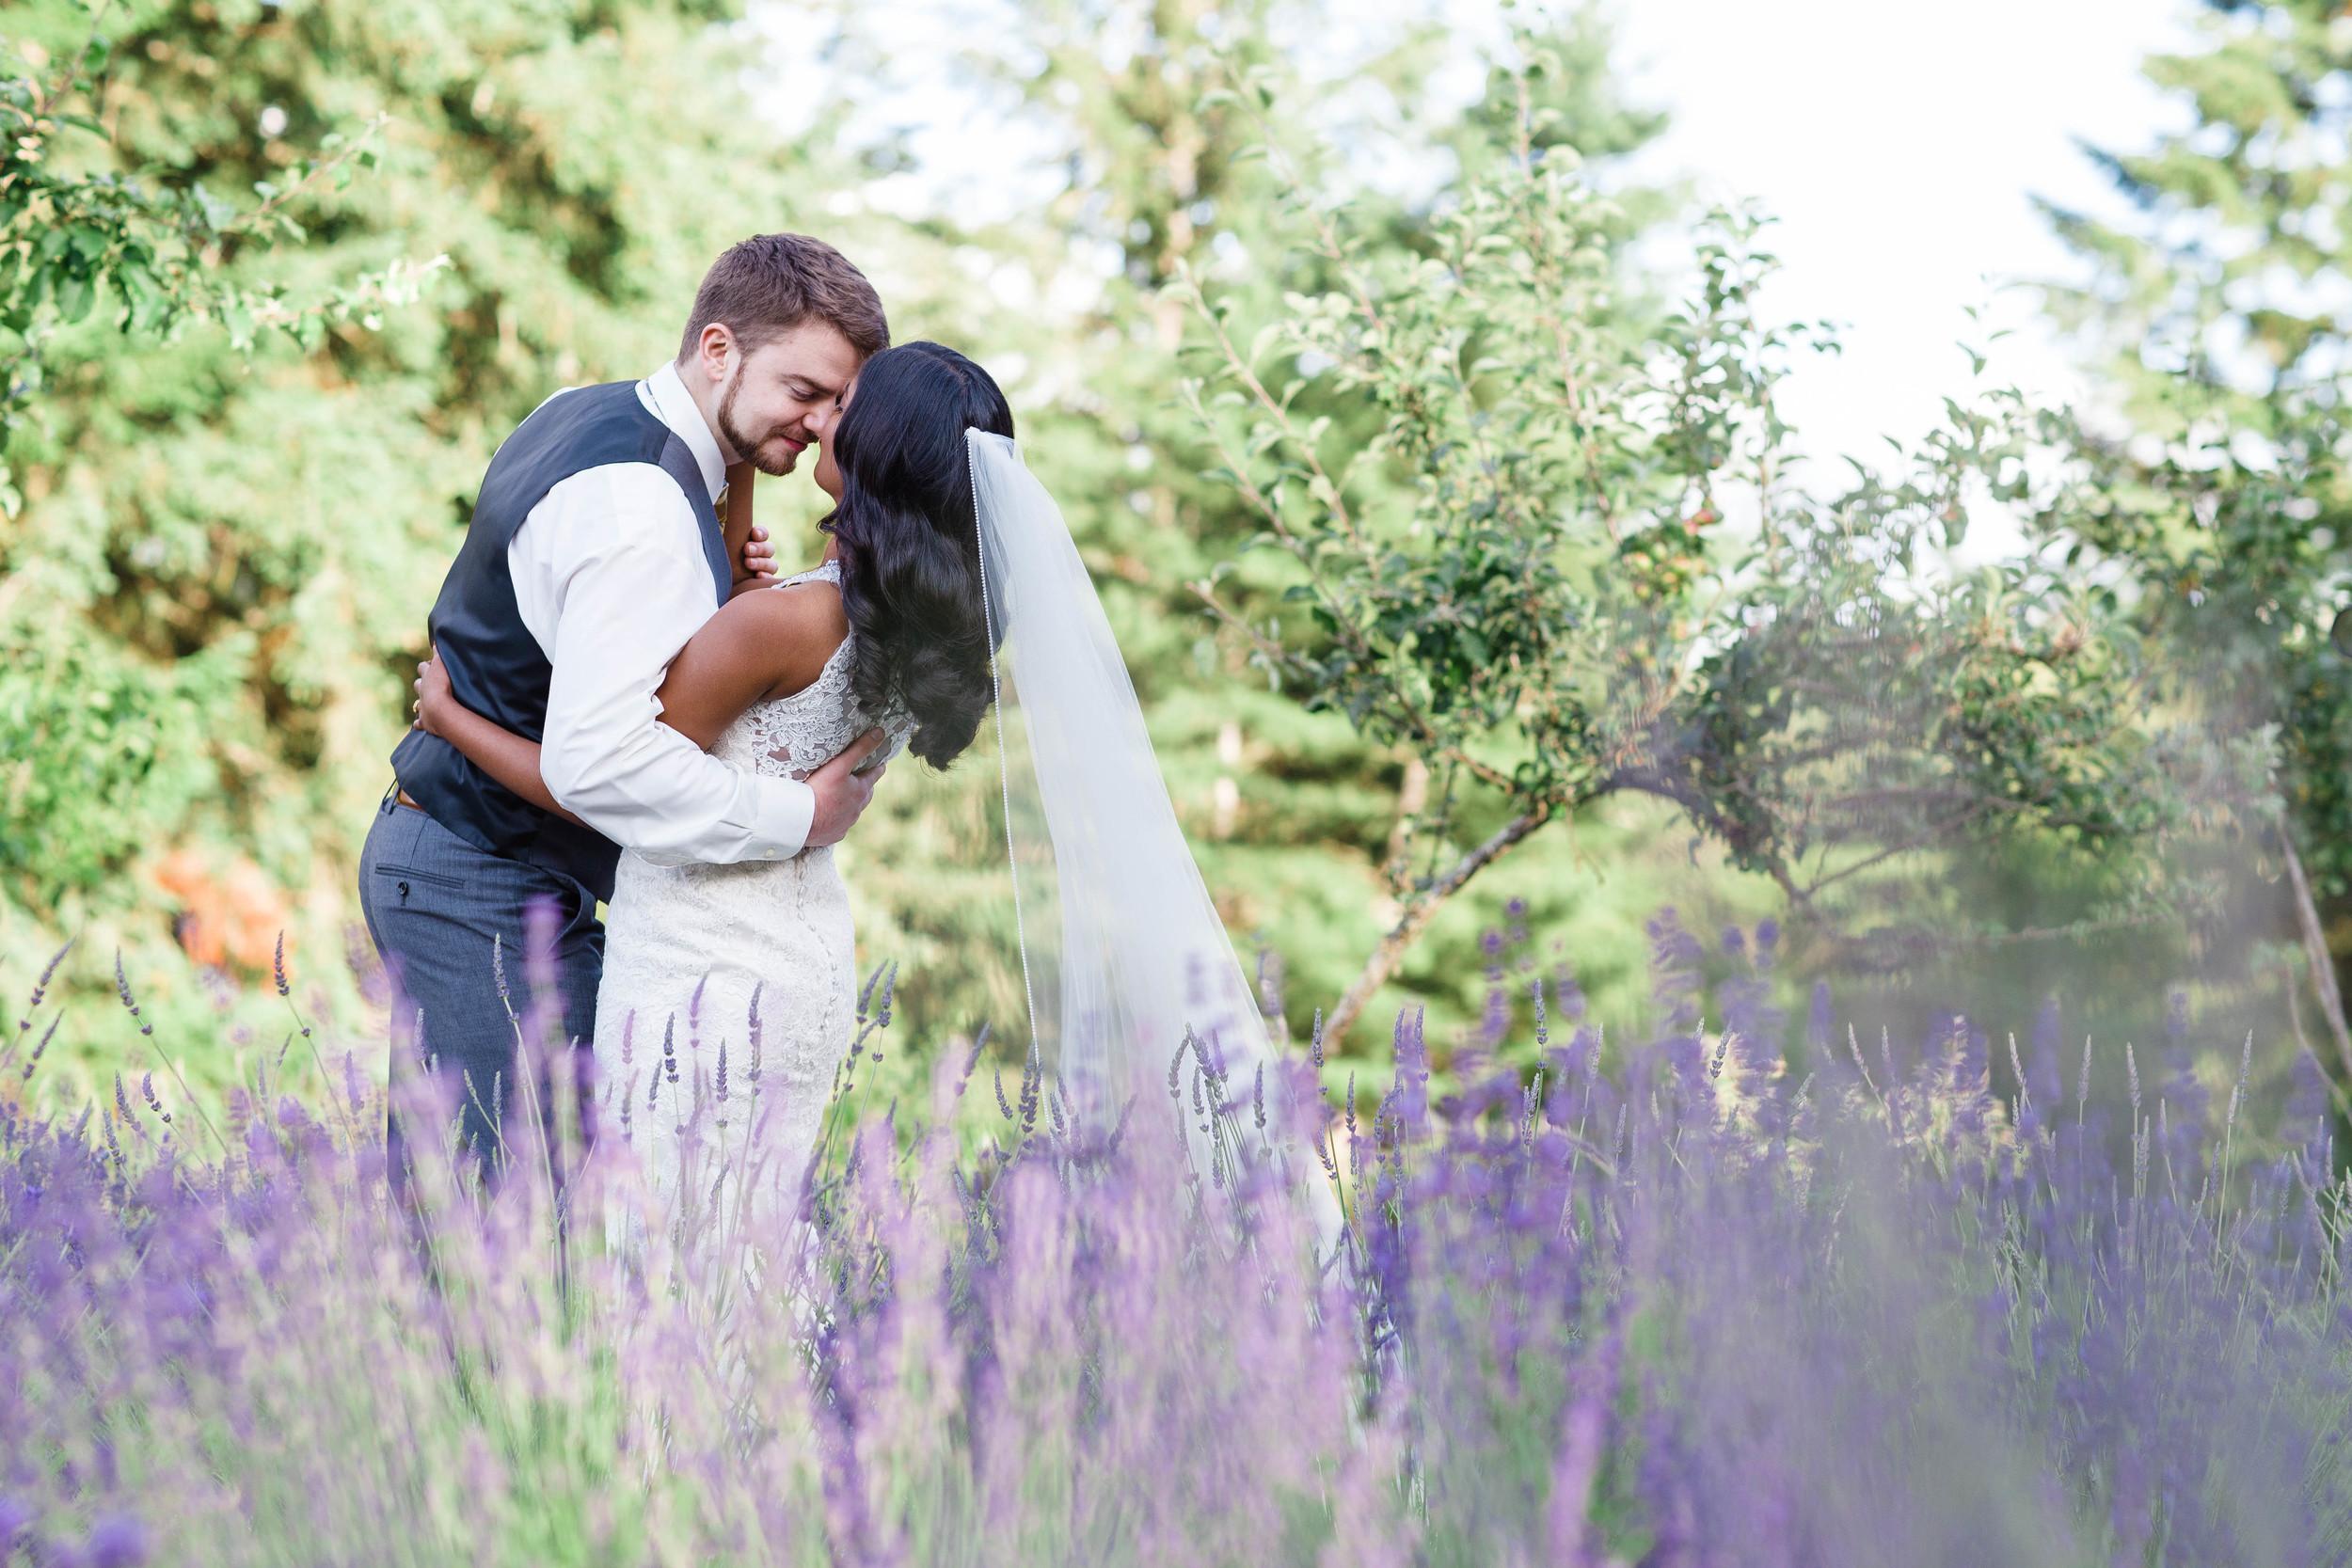 Hima+Dan_Wedding_Seattle+Couple_Kingston_6112016_173.jpg